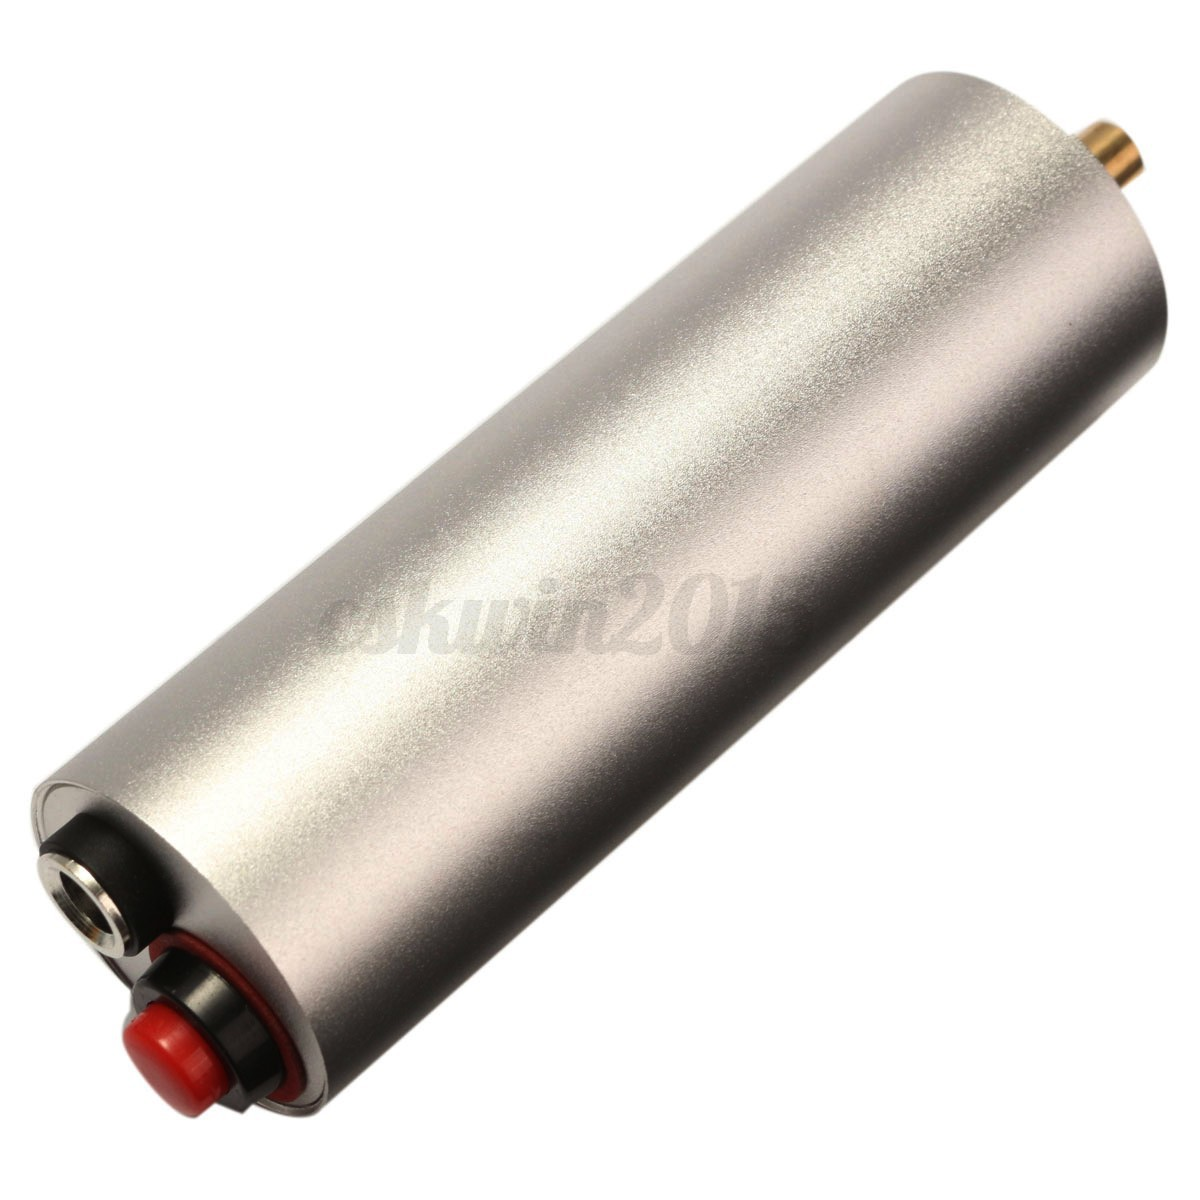 Mini Electric Hand Drill Handdrill Dc Motor W Jt0 Chuck